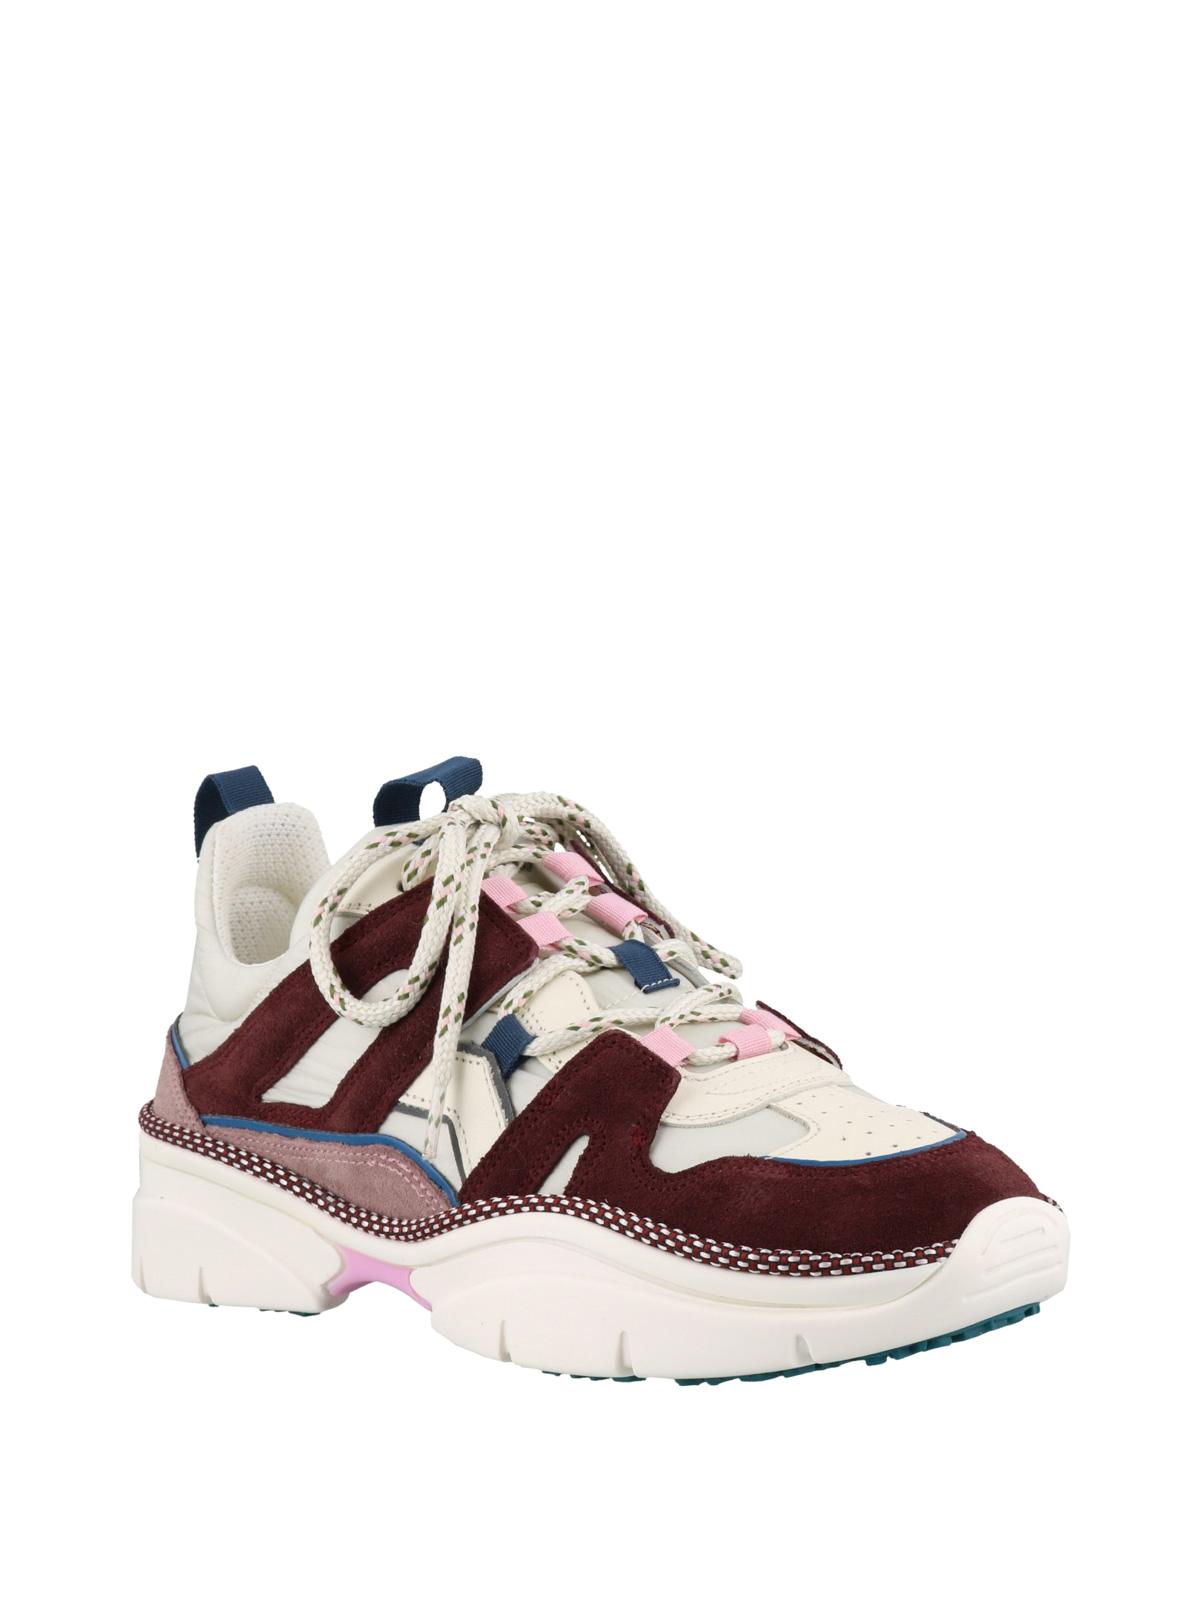 Isabel Marant - Kindsay sneakers